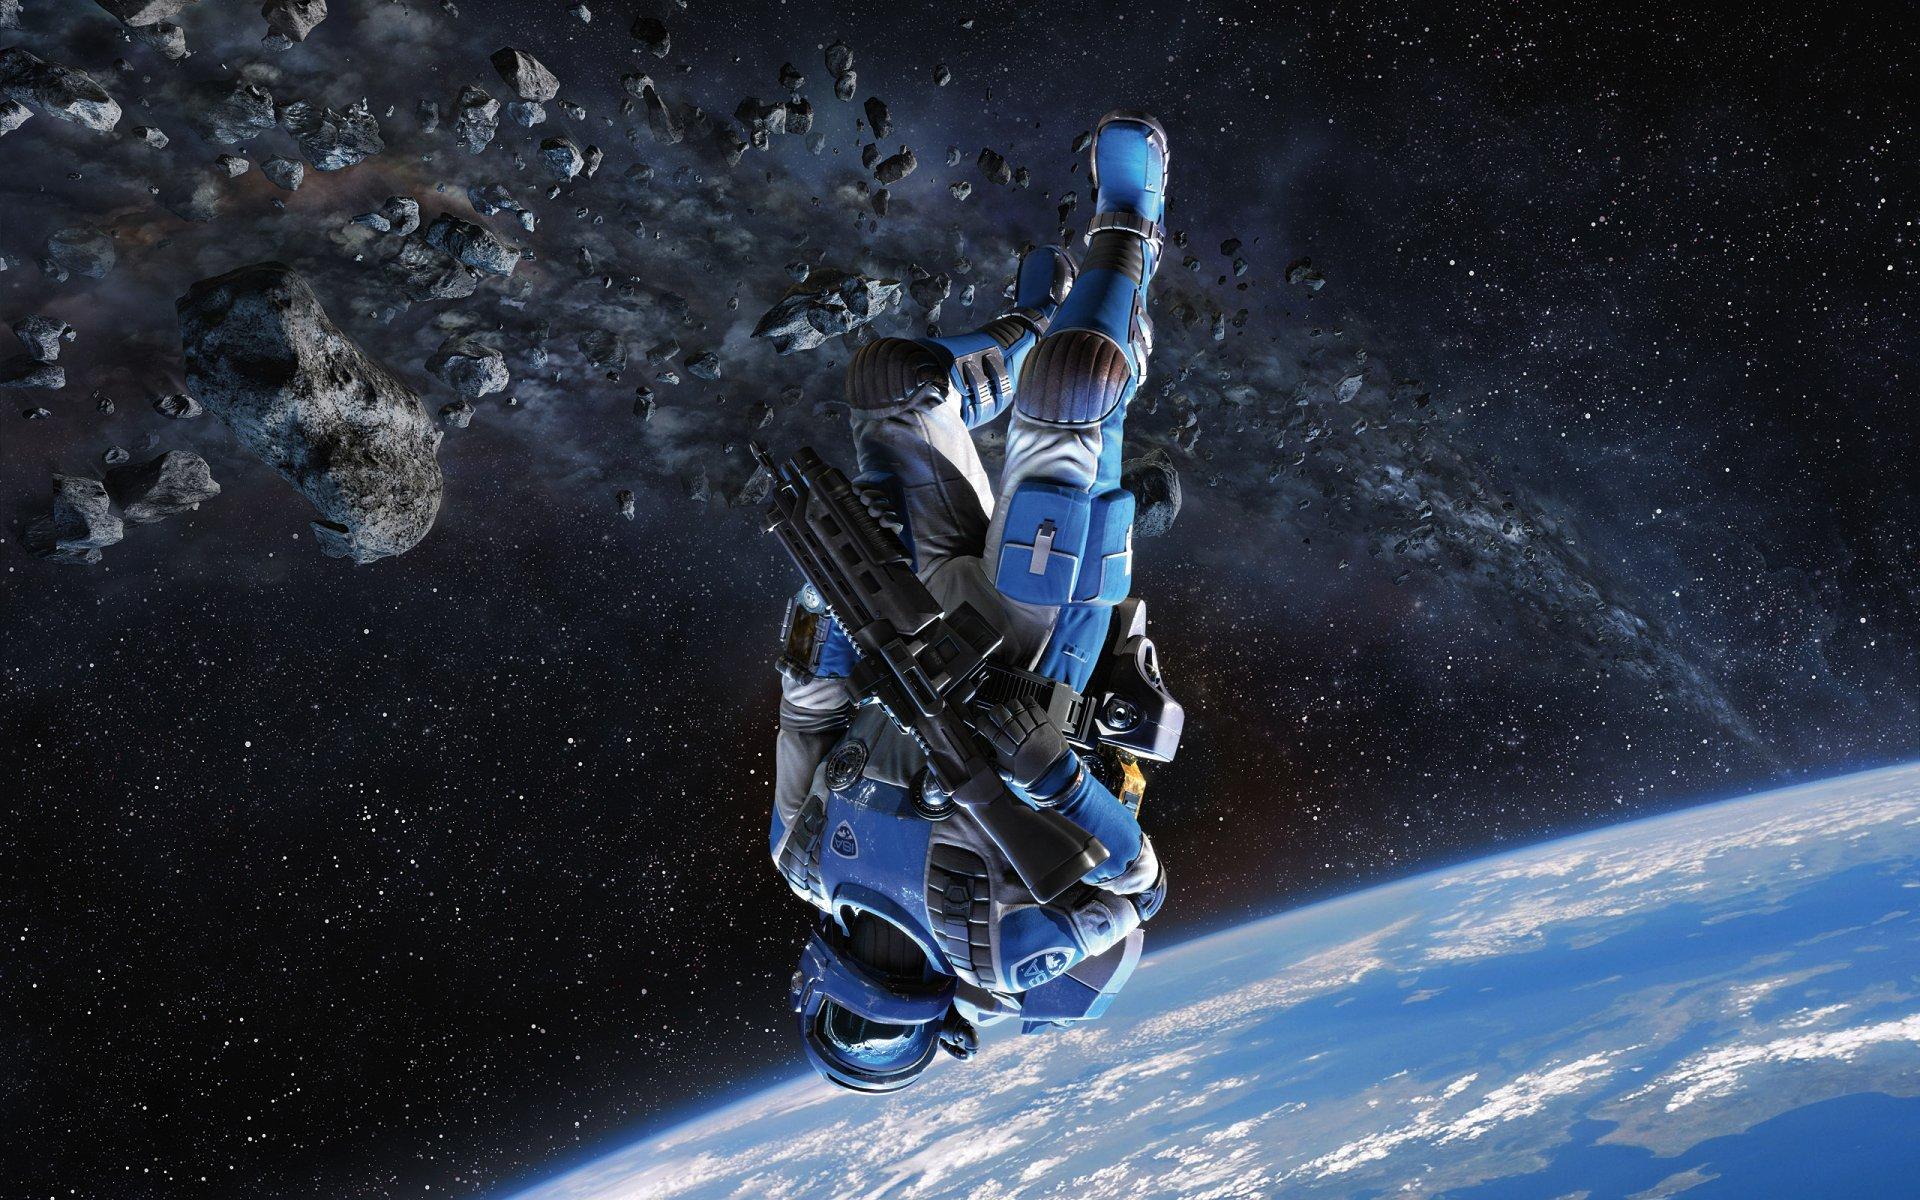 Sci Fi - Warrior  Stars Space Soldier Wallpaper